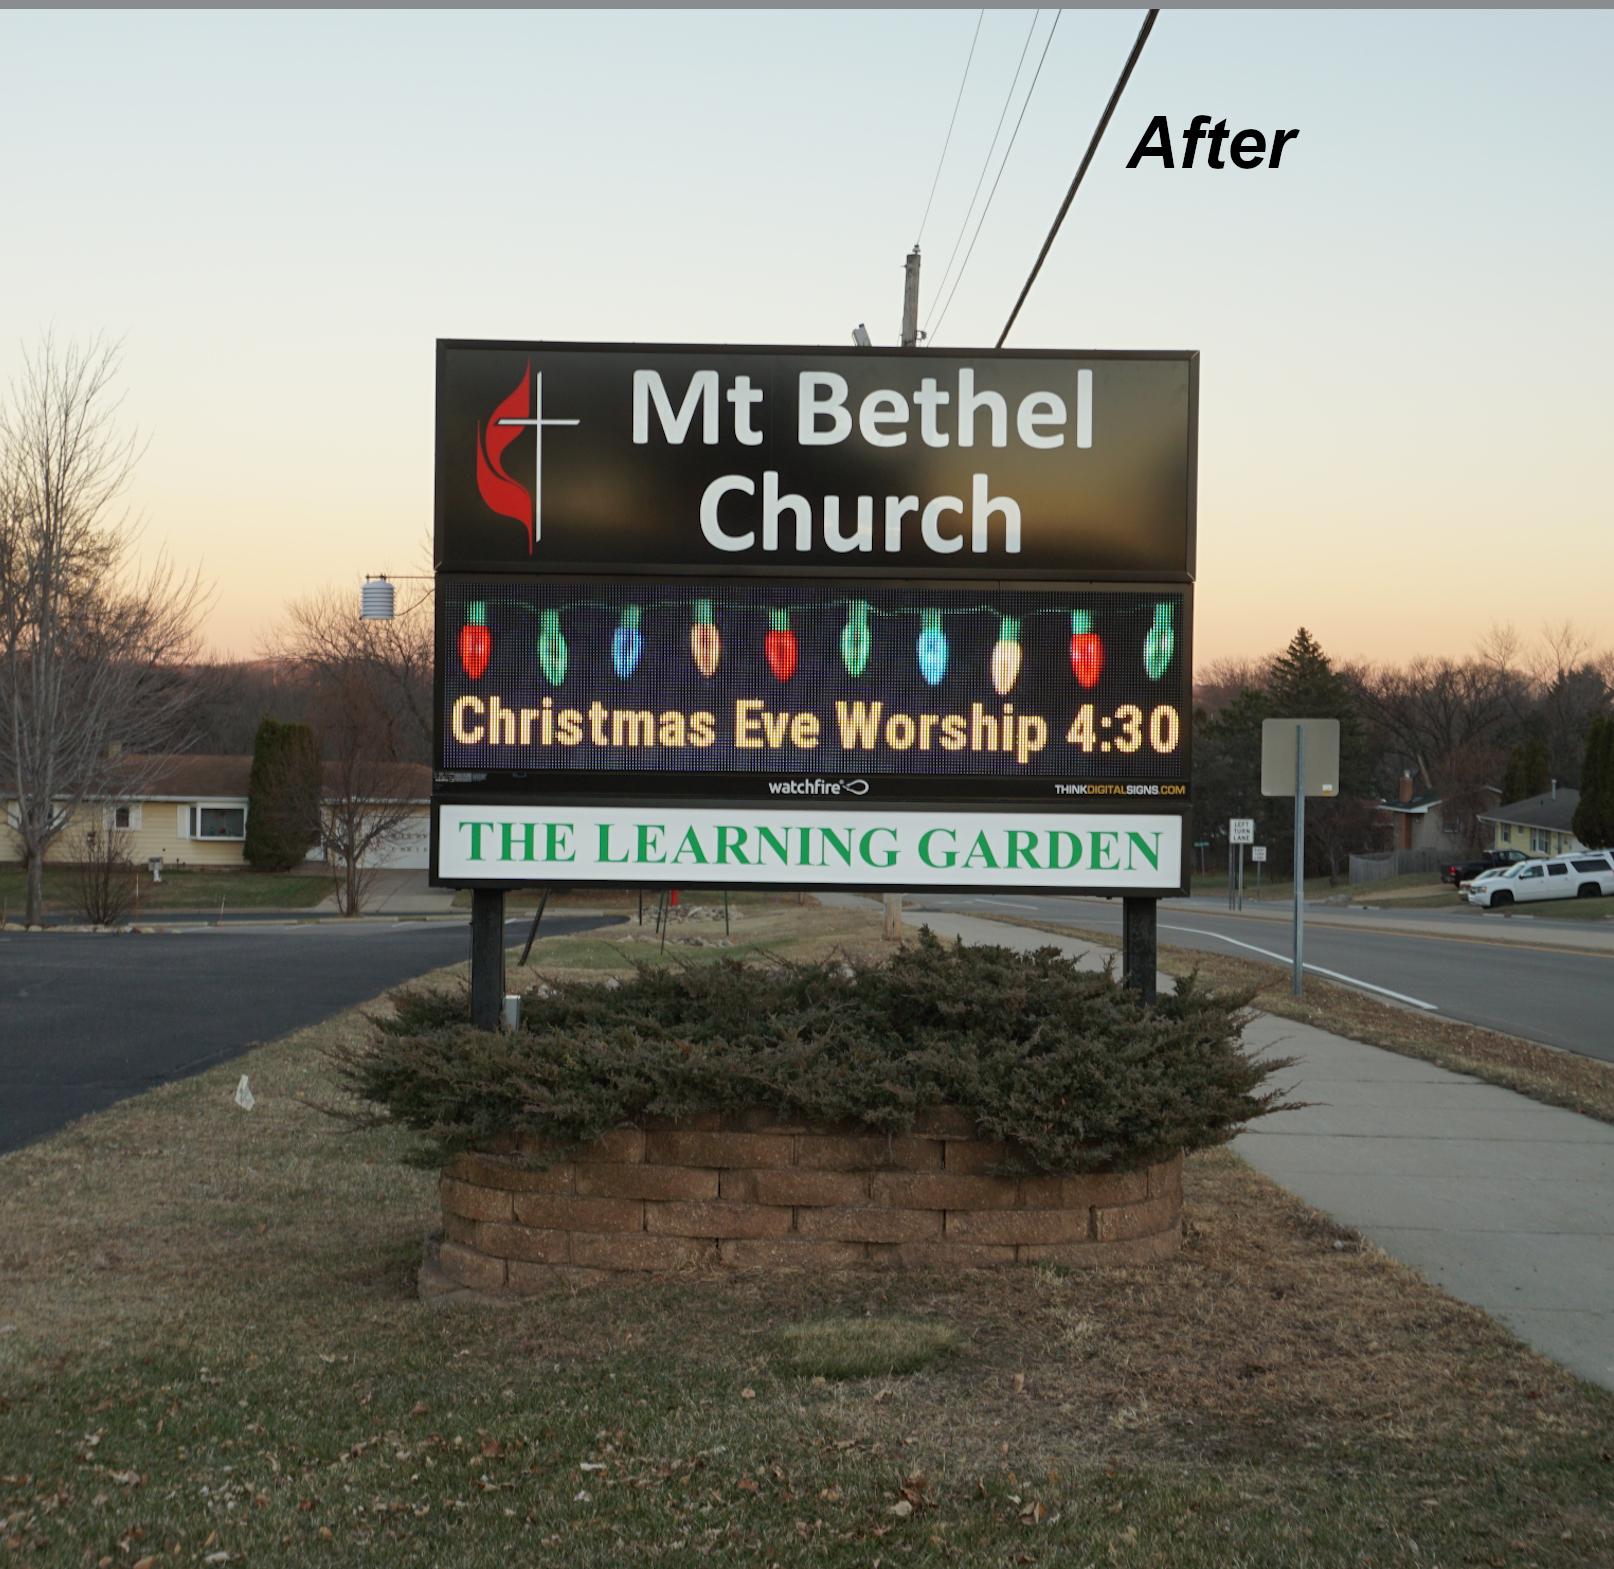 Mount Bethel Dynamic Display (After)